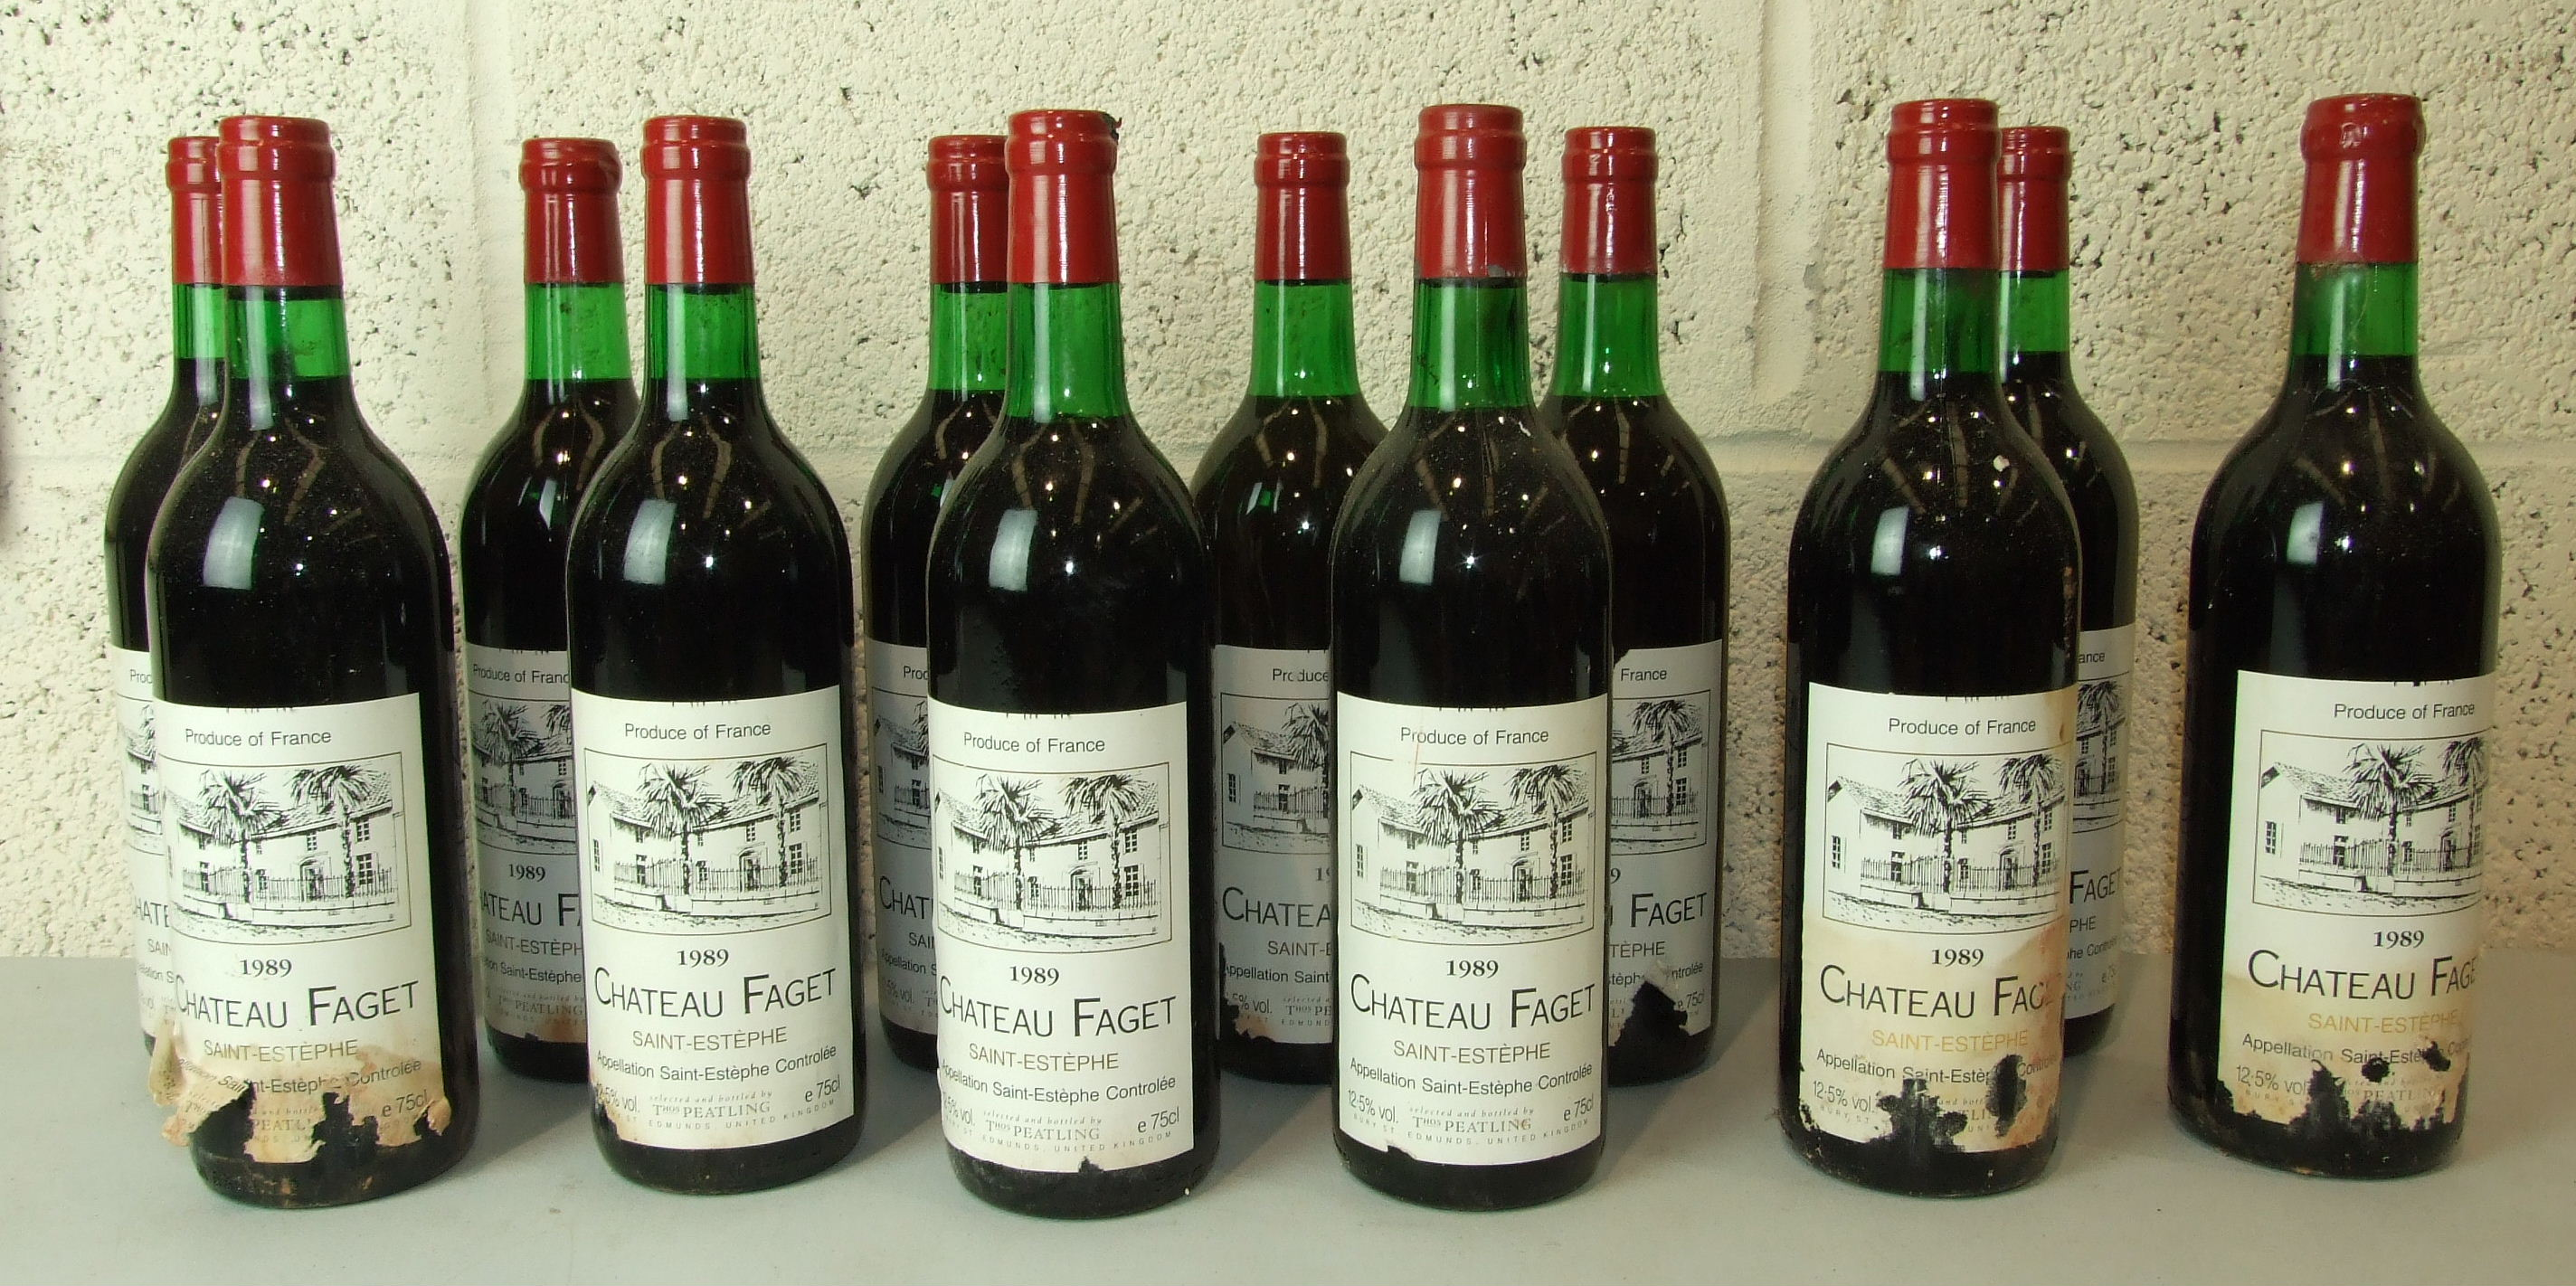 Lot 5 - France, Chateau Faget Saint Estephe 1989, high shoulder, mainly good labels, twenty-six bottles, (